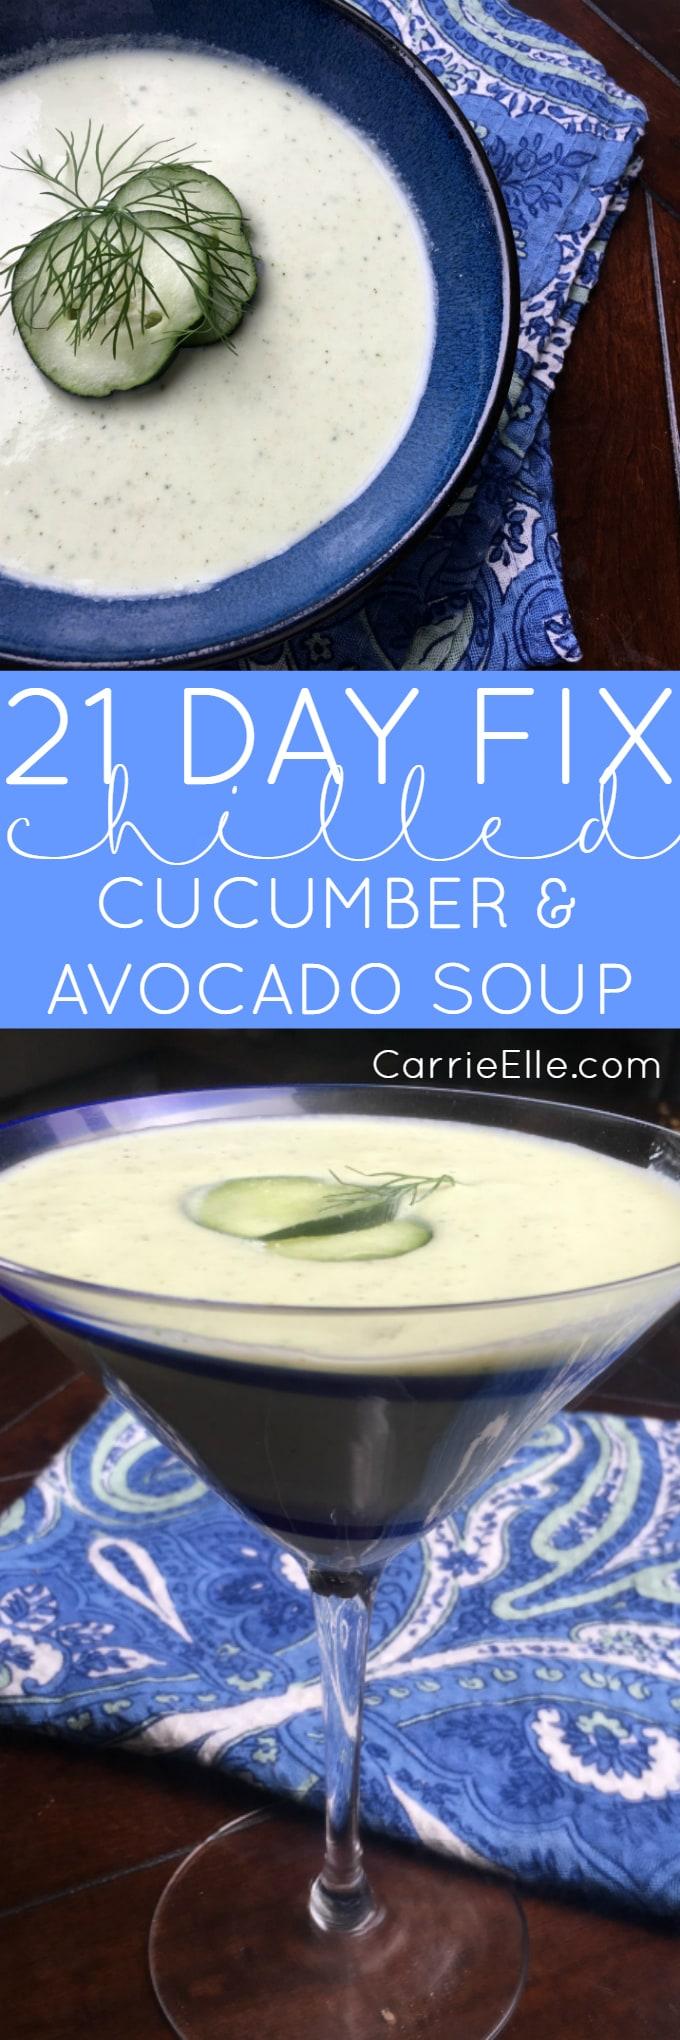 21 Day Fix Cucumber Avocado Soup